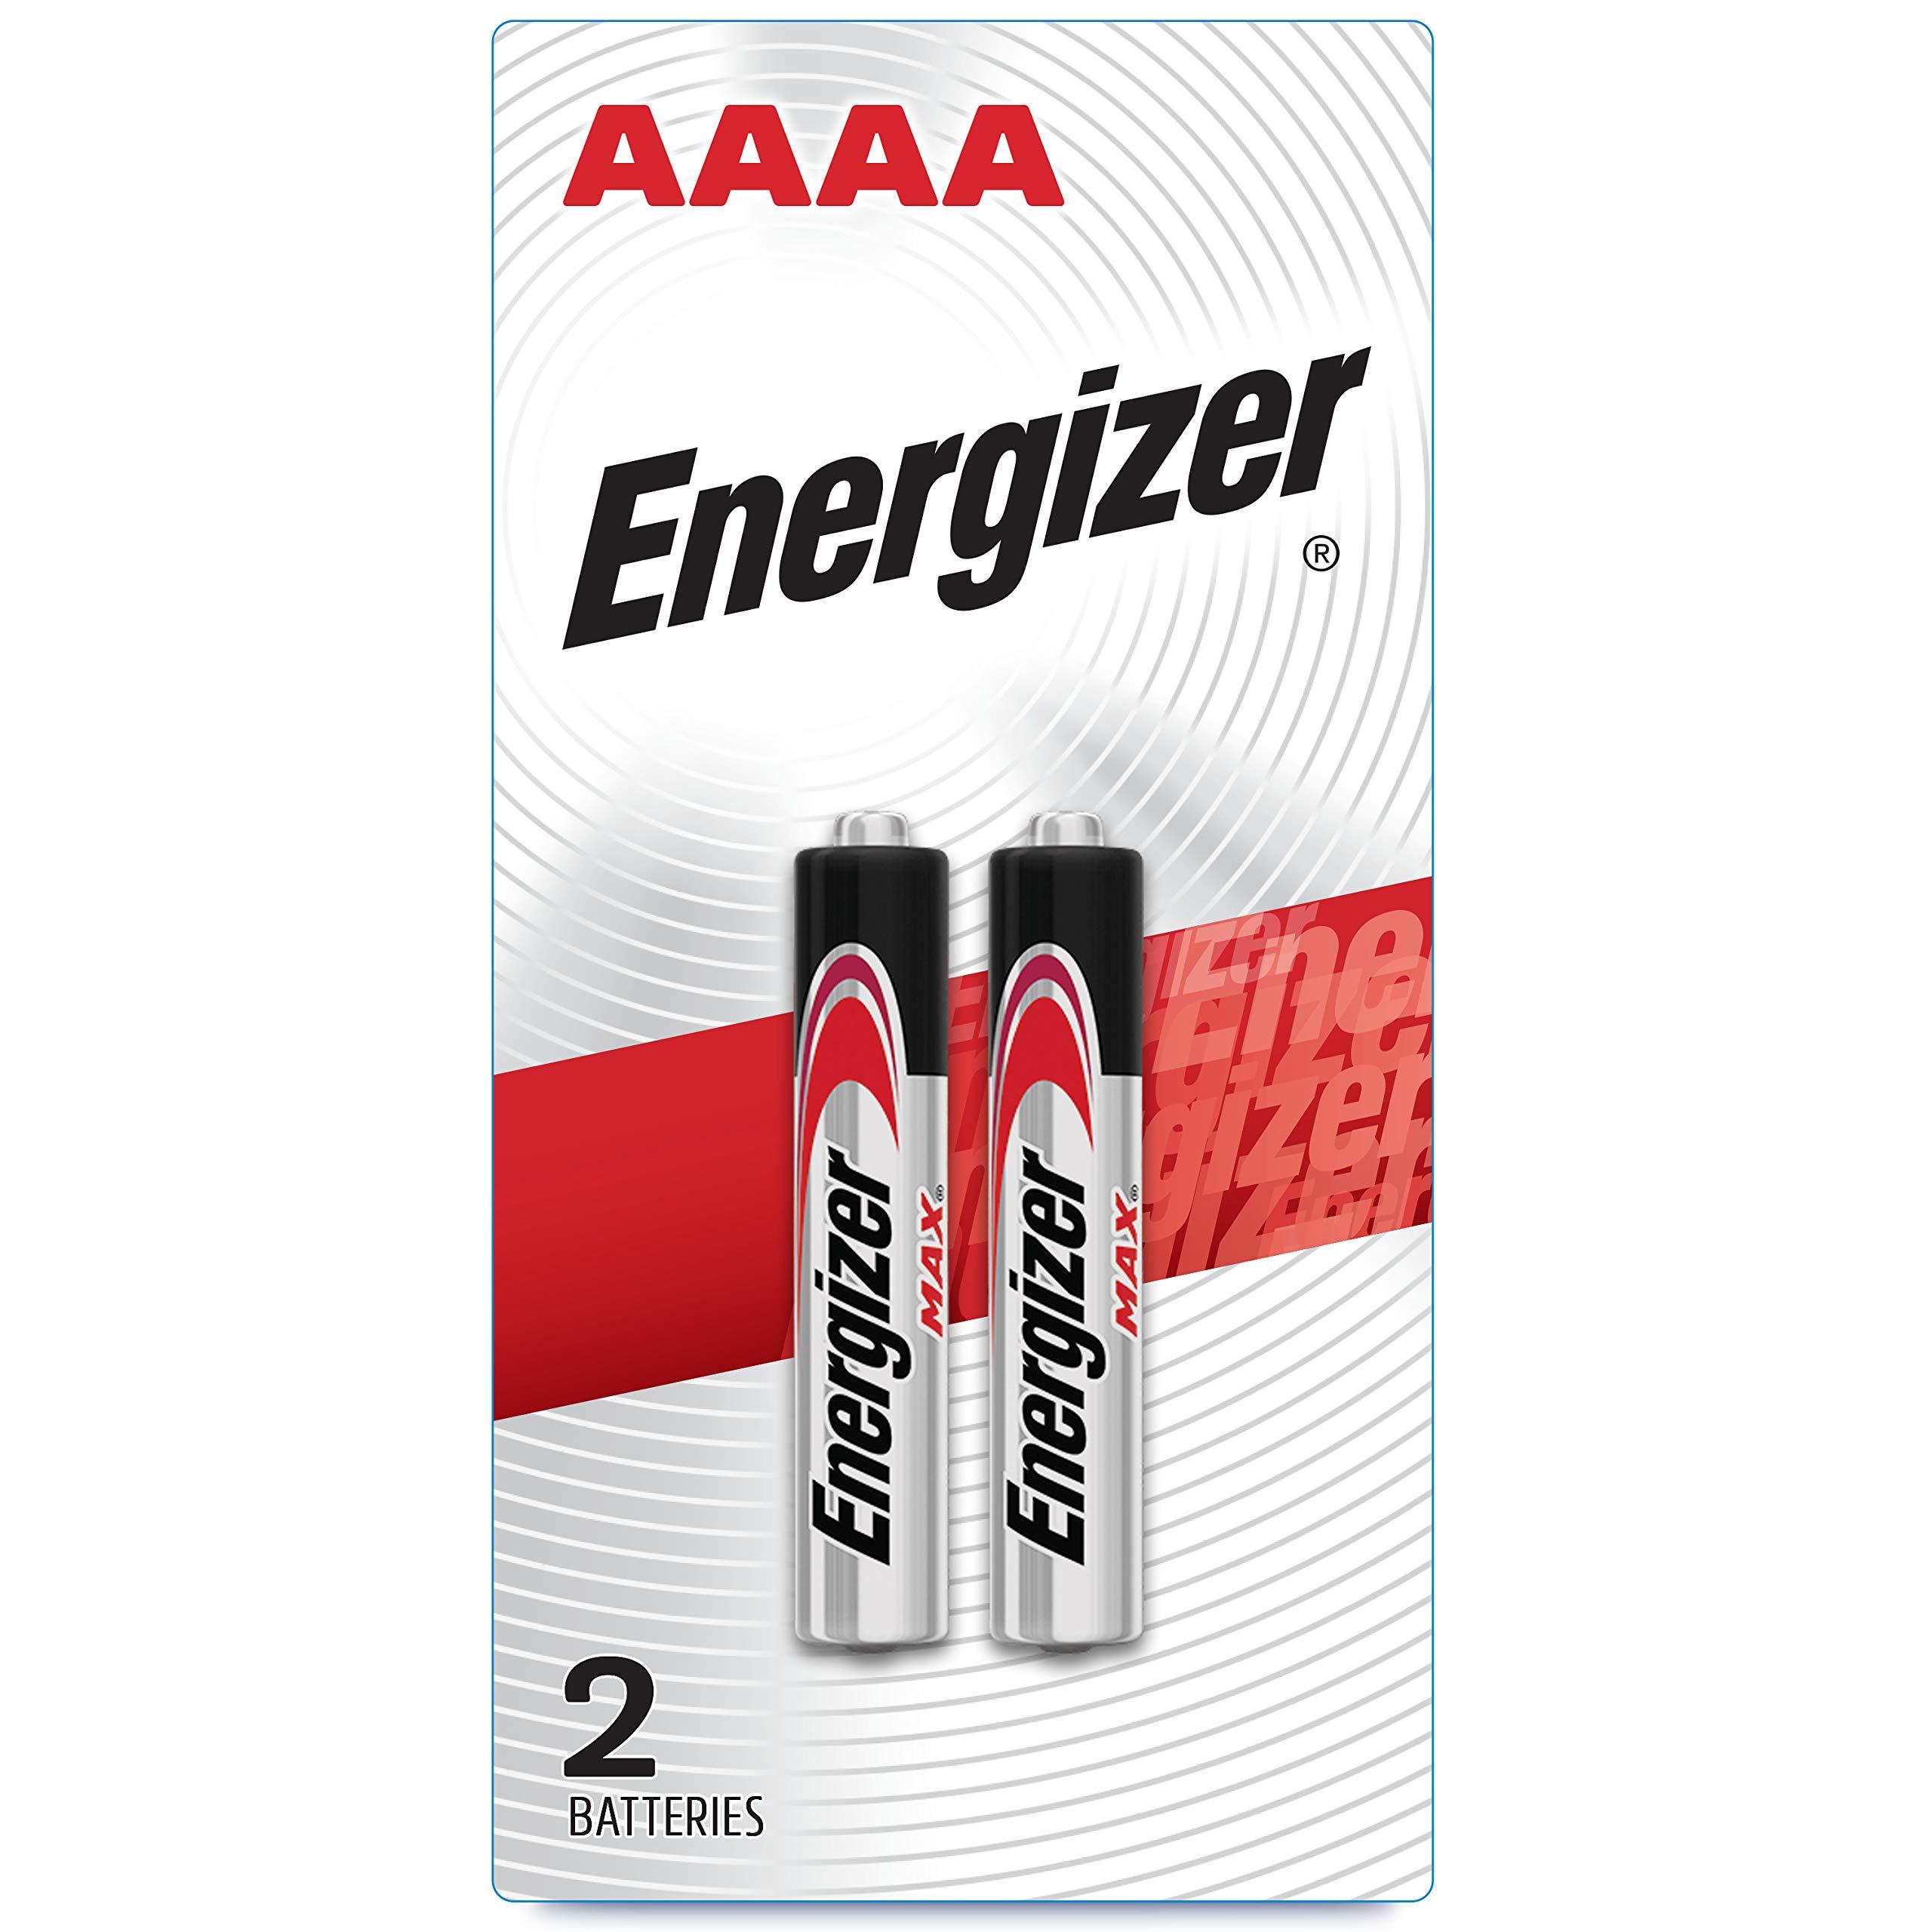 Energizer AAAA Batteries, 1.5V Alkaline AAAA Battery (2 Pack)